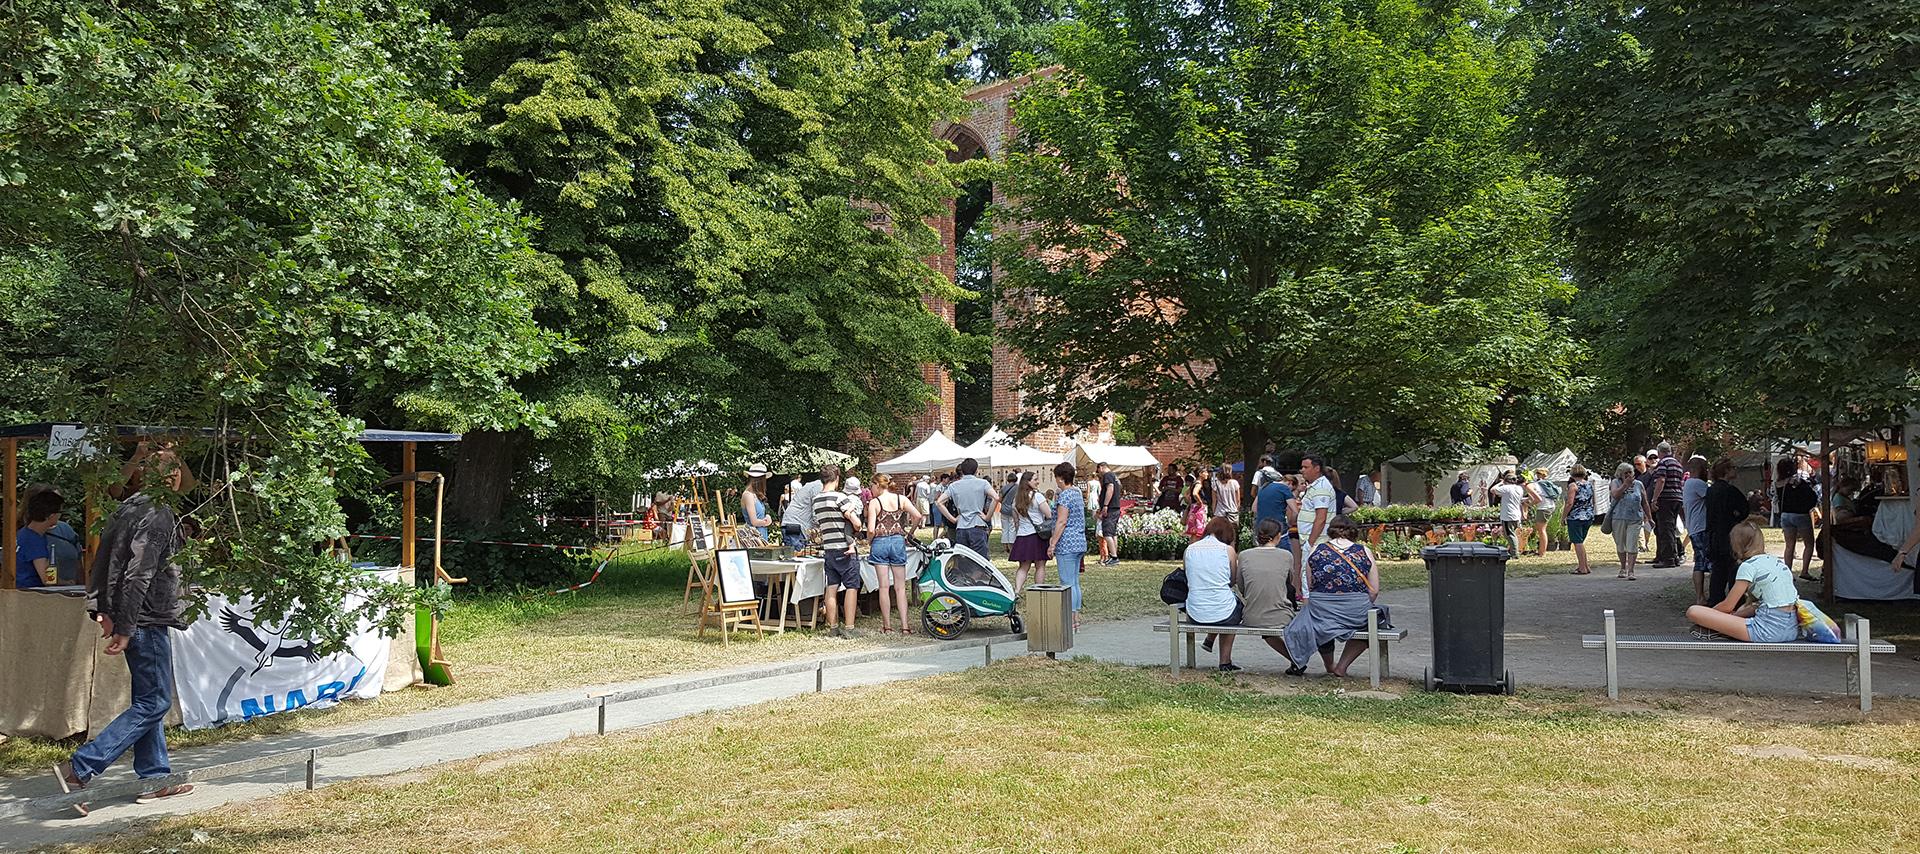 5. Klostermarkt in Greifswald-Eldena